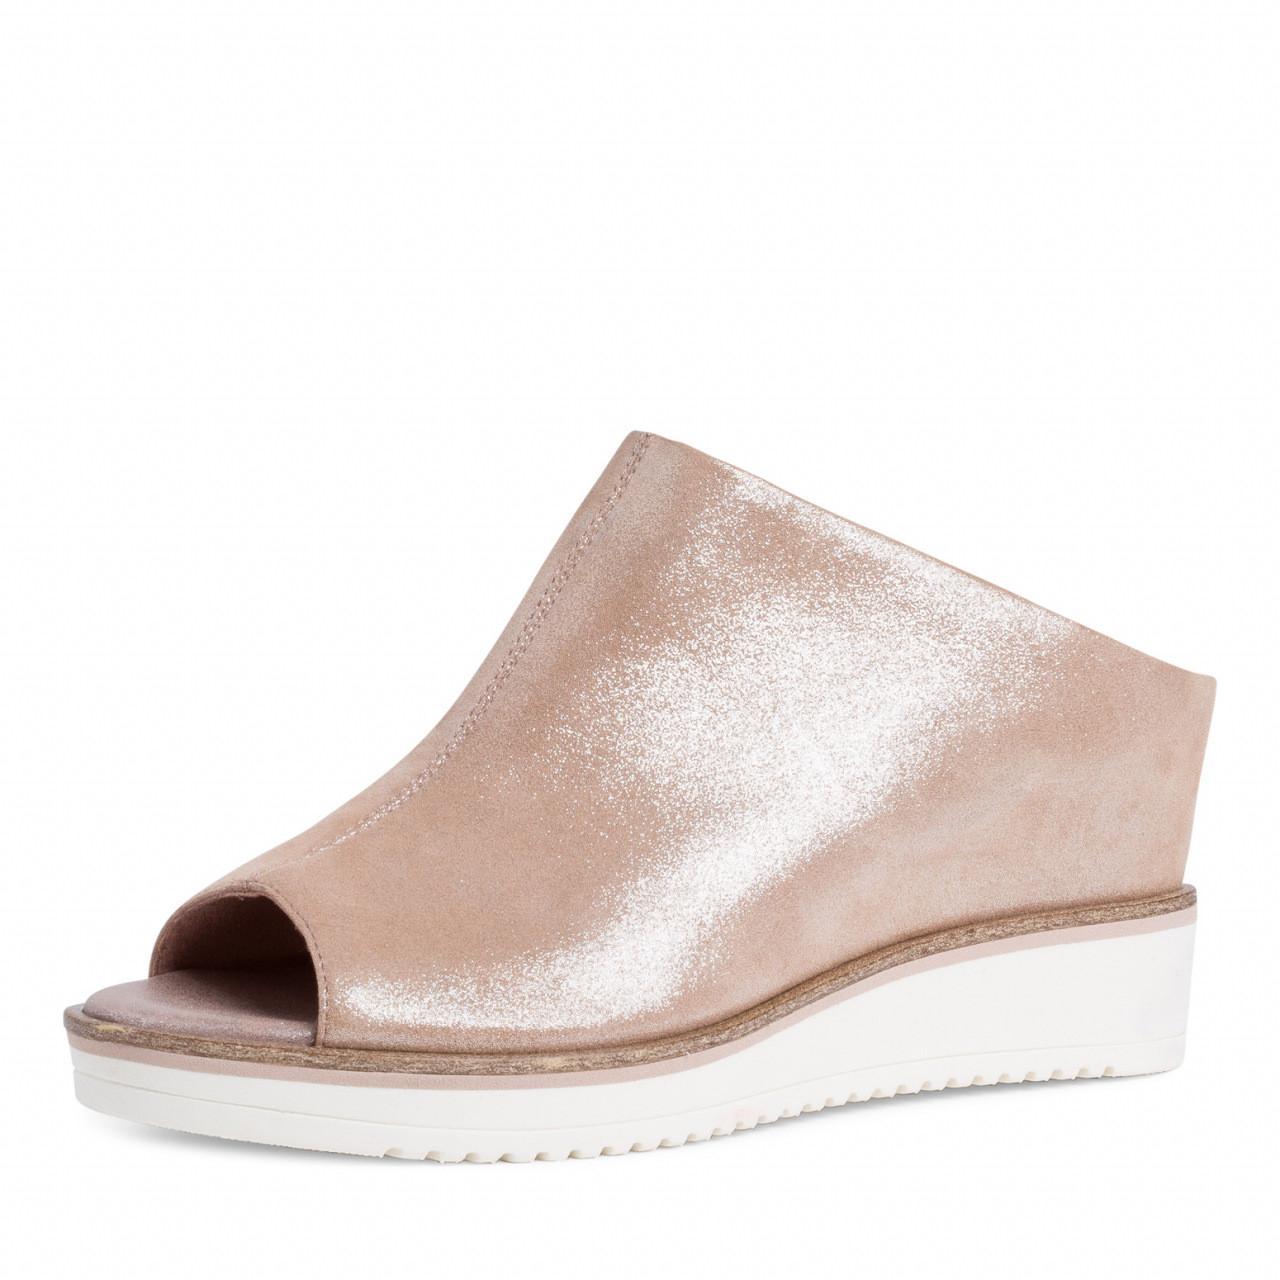 Rosa sandaler fra Tamaris – Tamaris lys rosa sandal med kilehel – Mio Trend